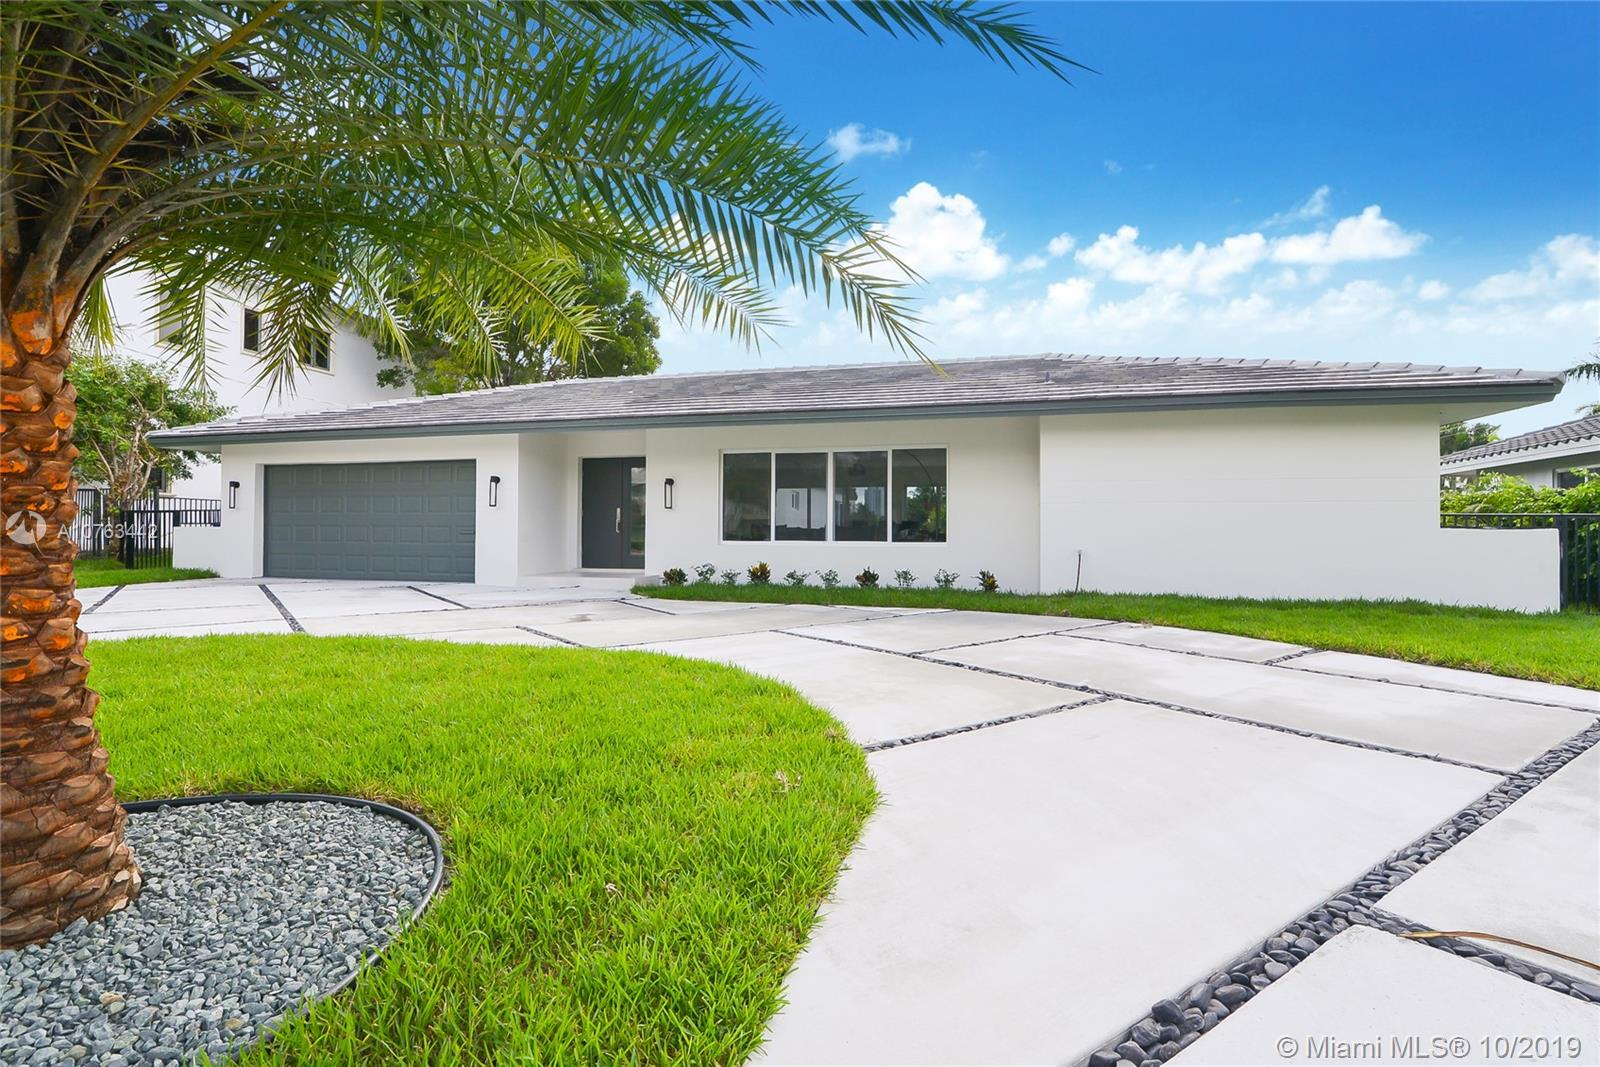 519 Layne Blvd - Hallandale Beach, Florida